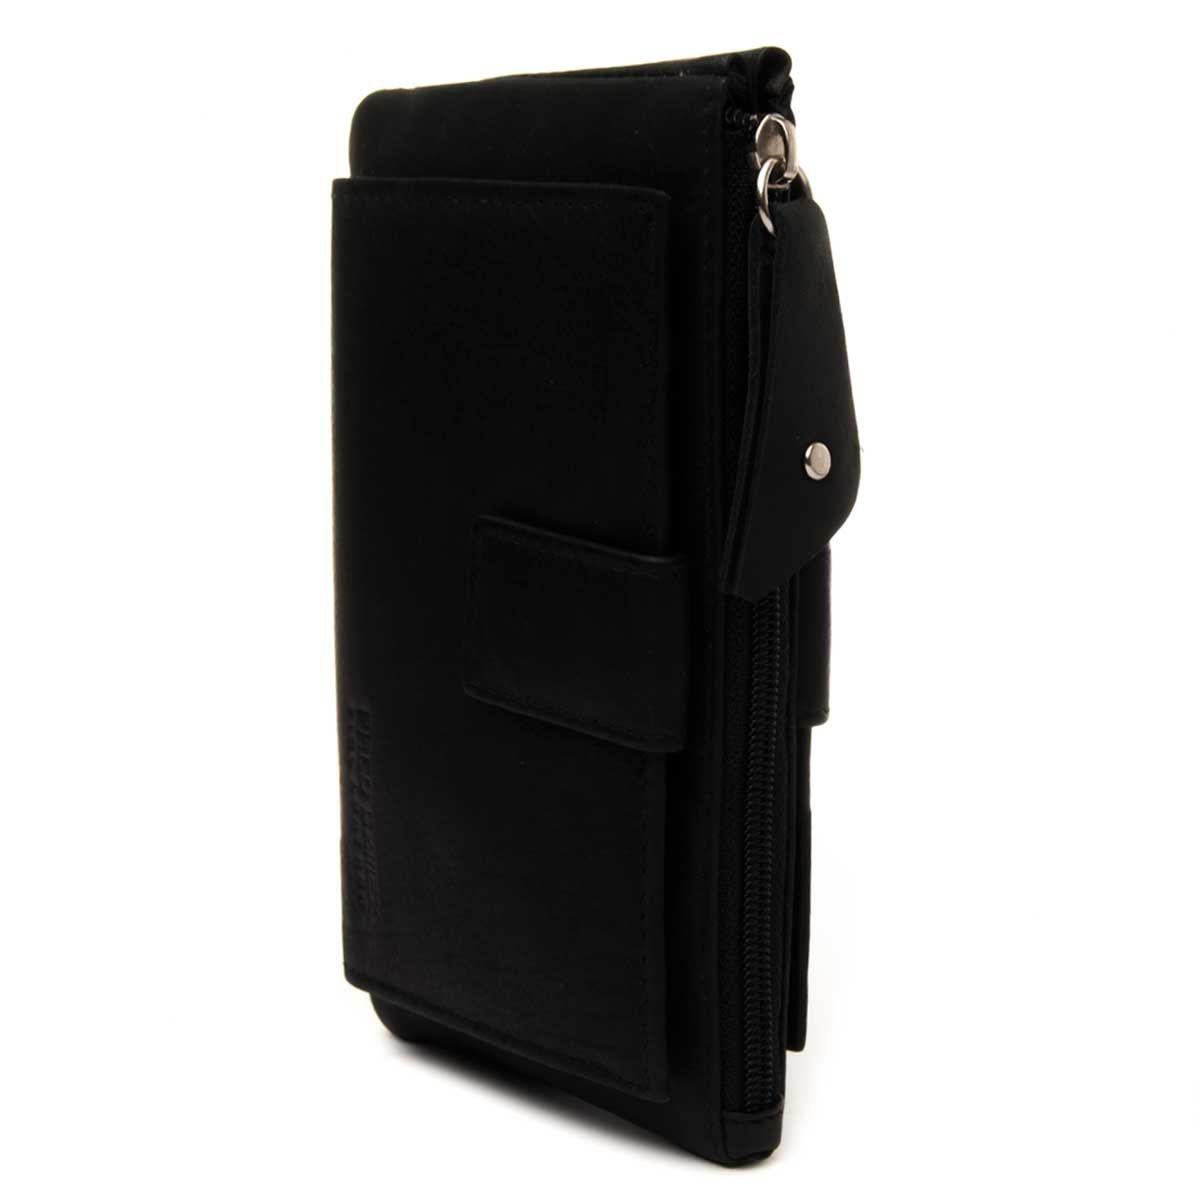 Montevita Leather Purse in Black